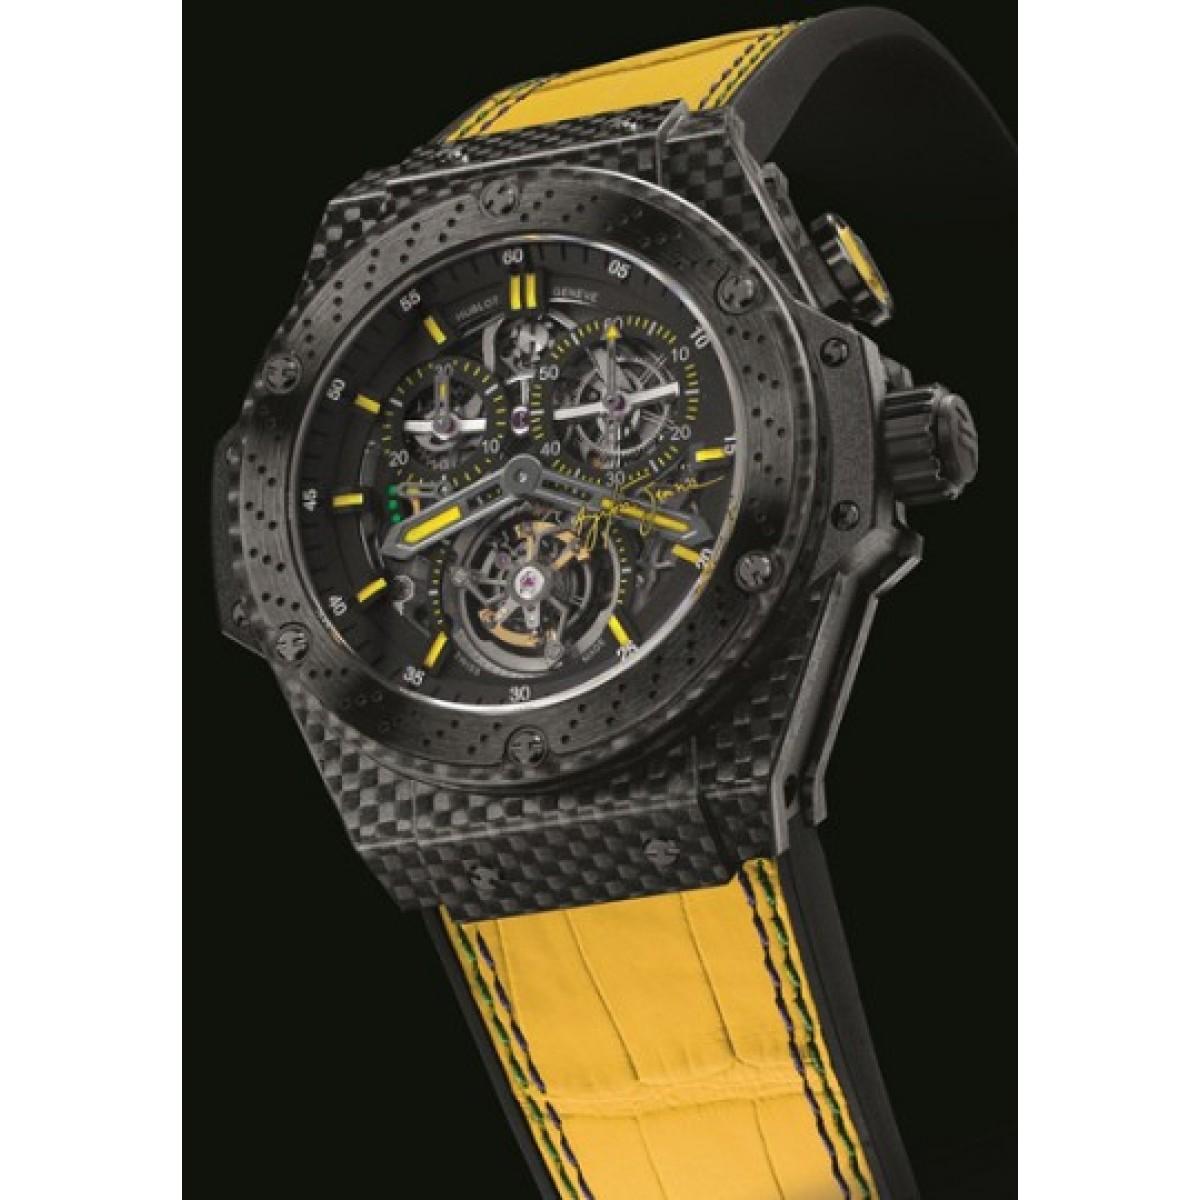 436d4aa5572 Relógio Réplica Hublot King Power Ayrton Senna